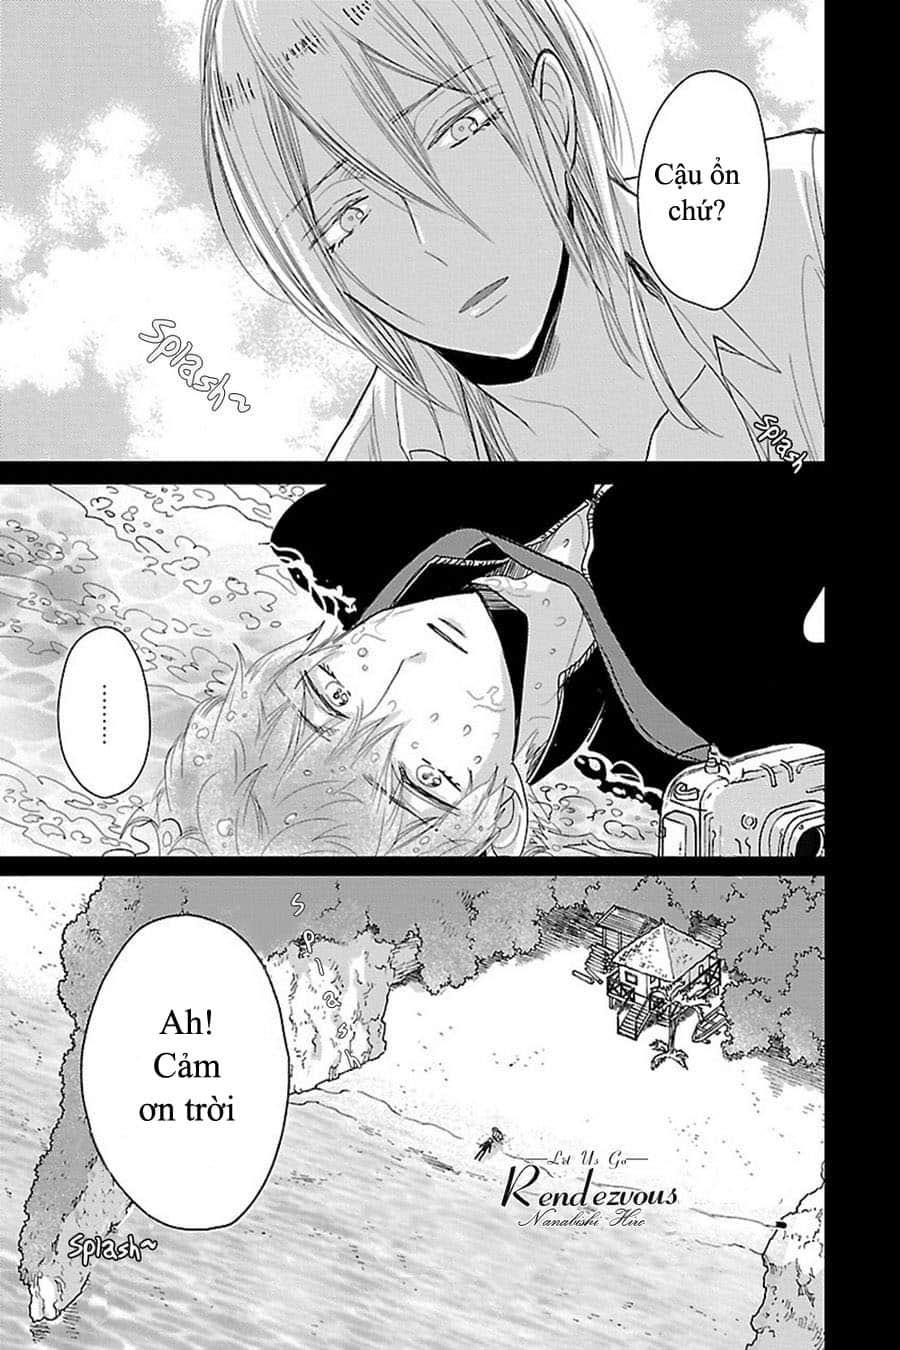 Trang 4 - [NANABISHI Hiro] Rendezvouz (- NANABISHI Hiro) - Truyện tranh Gay - Server HostedOnGoogleServerStaging